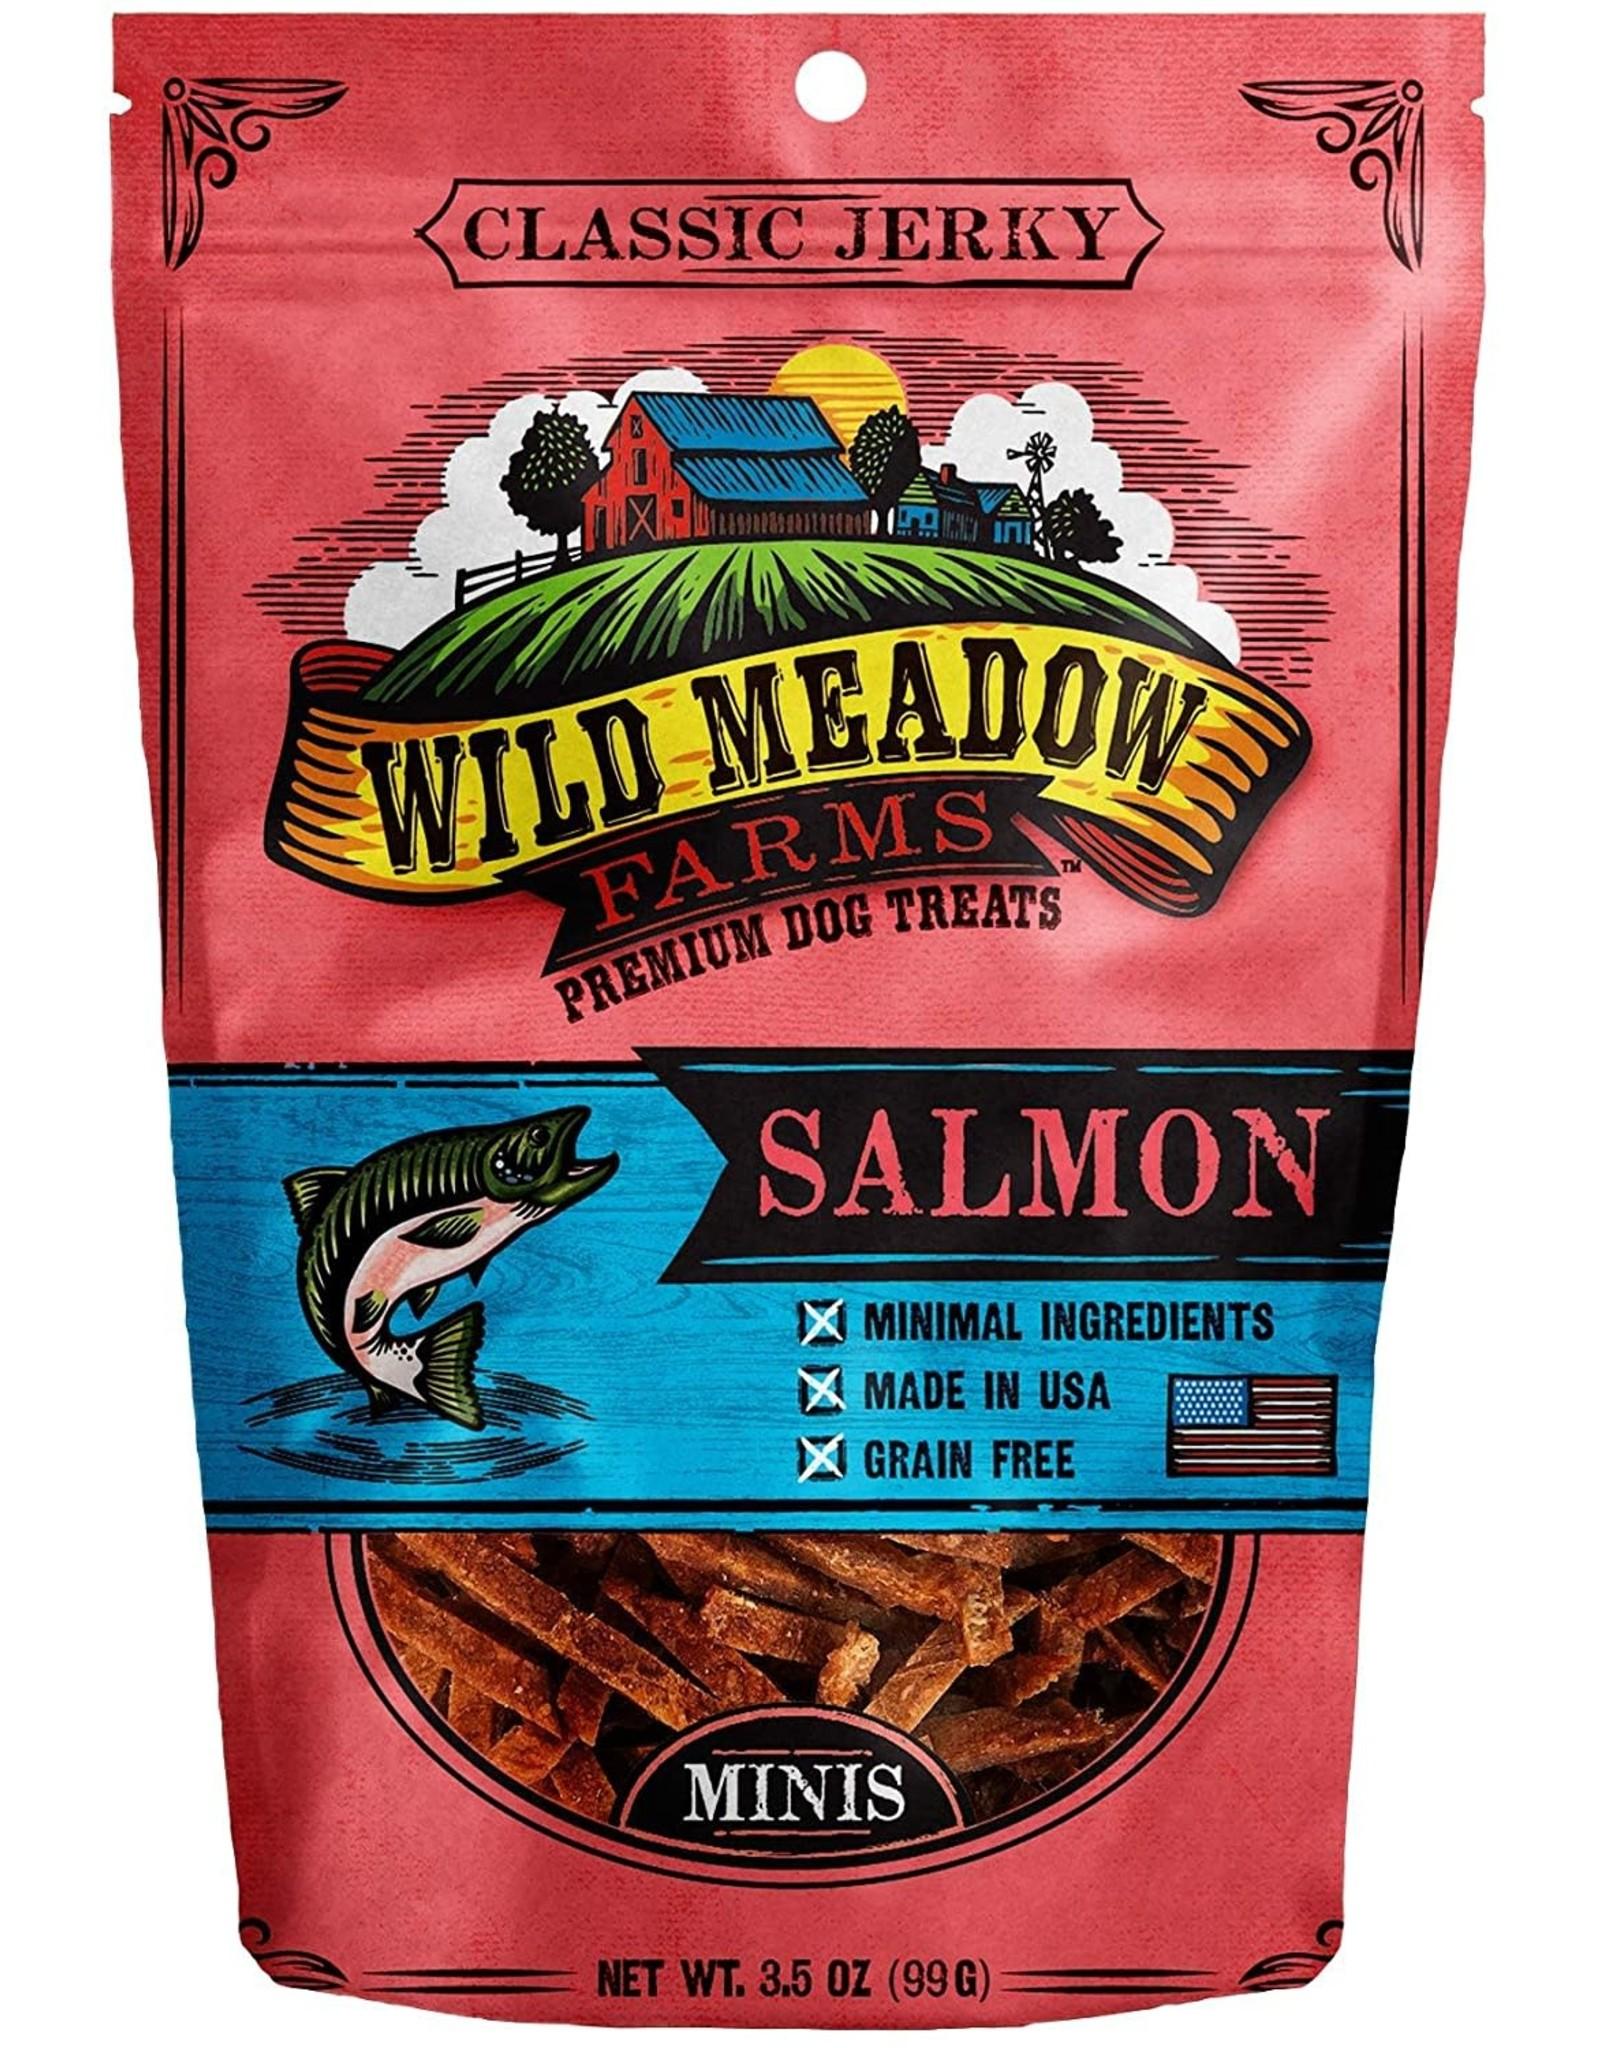 Wild Meadow Farms Wild Meadow Farms Classic Minis: Salmon, 3.5 oz